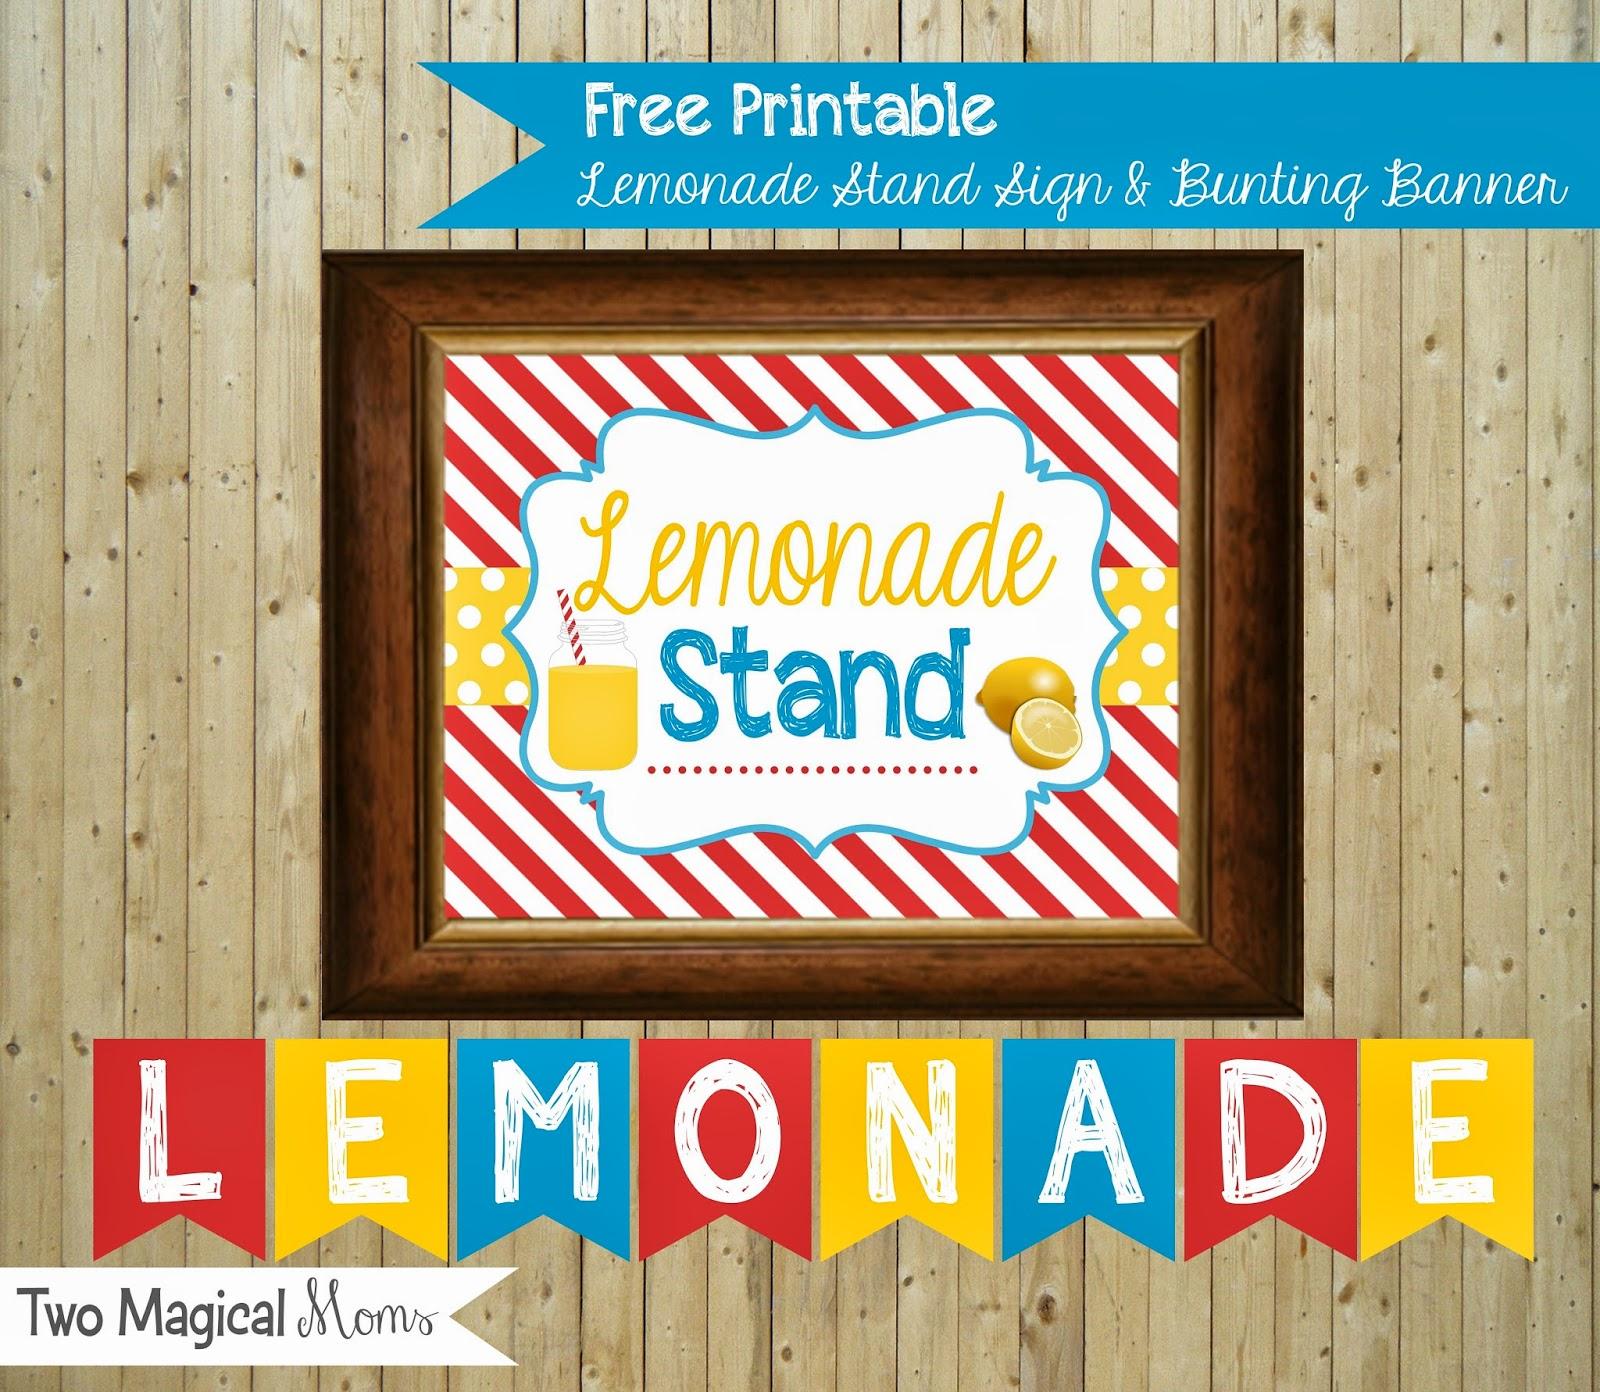 Two Magical Moms: Lemonade Stand Sign & Bunting Banner ... Lemonade Sign Kids